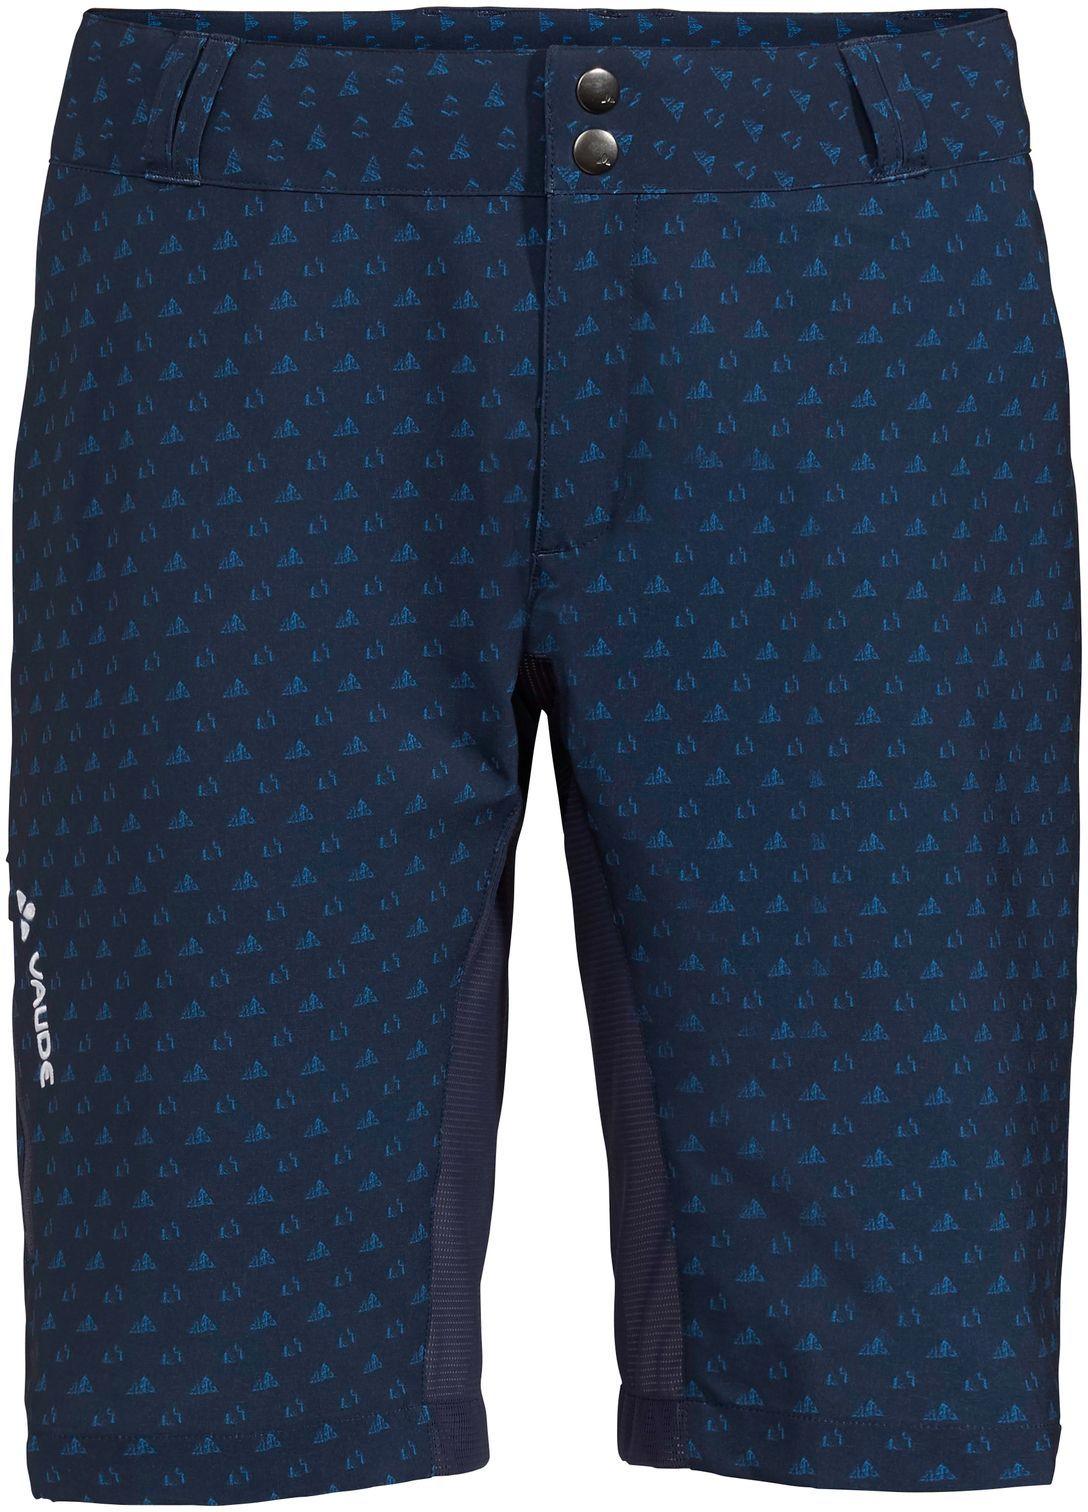 Vaude Women's Ligure Shorts - eclipse uni XS